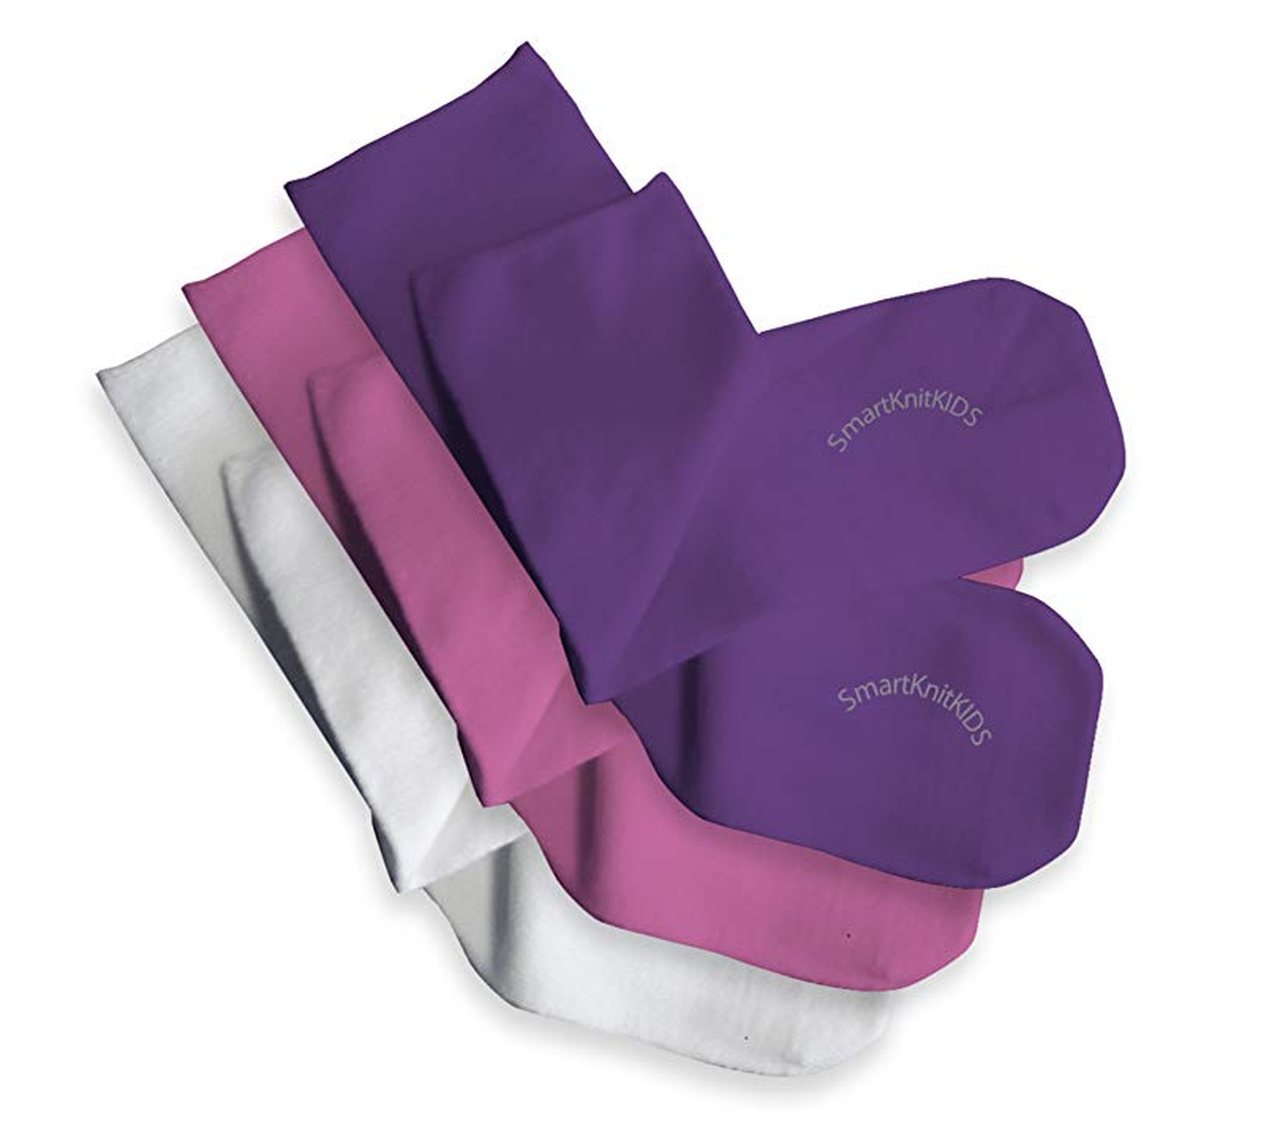 Image result for SmartKnitKIDS Sensory-Friendly Sensitivity Seamless Socks - 3 Pack